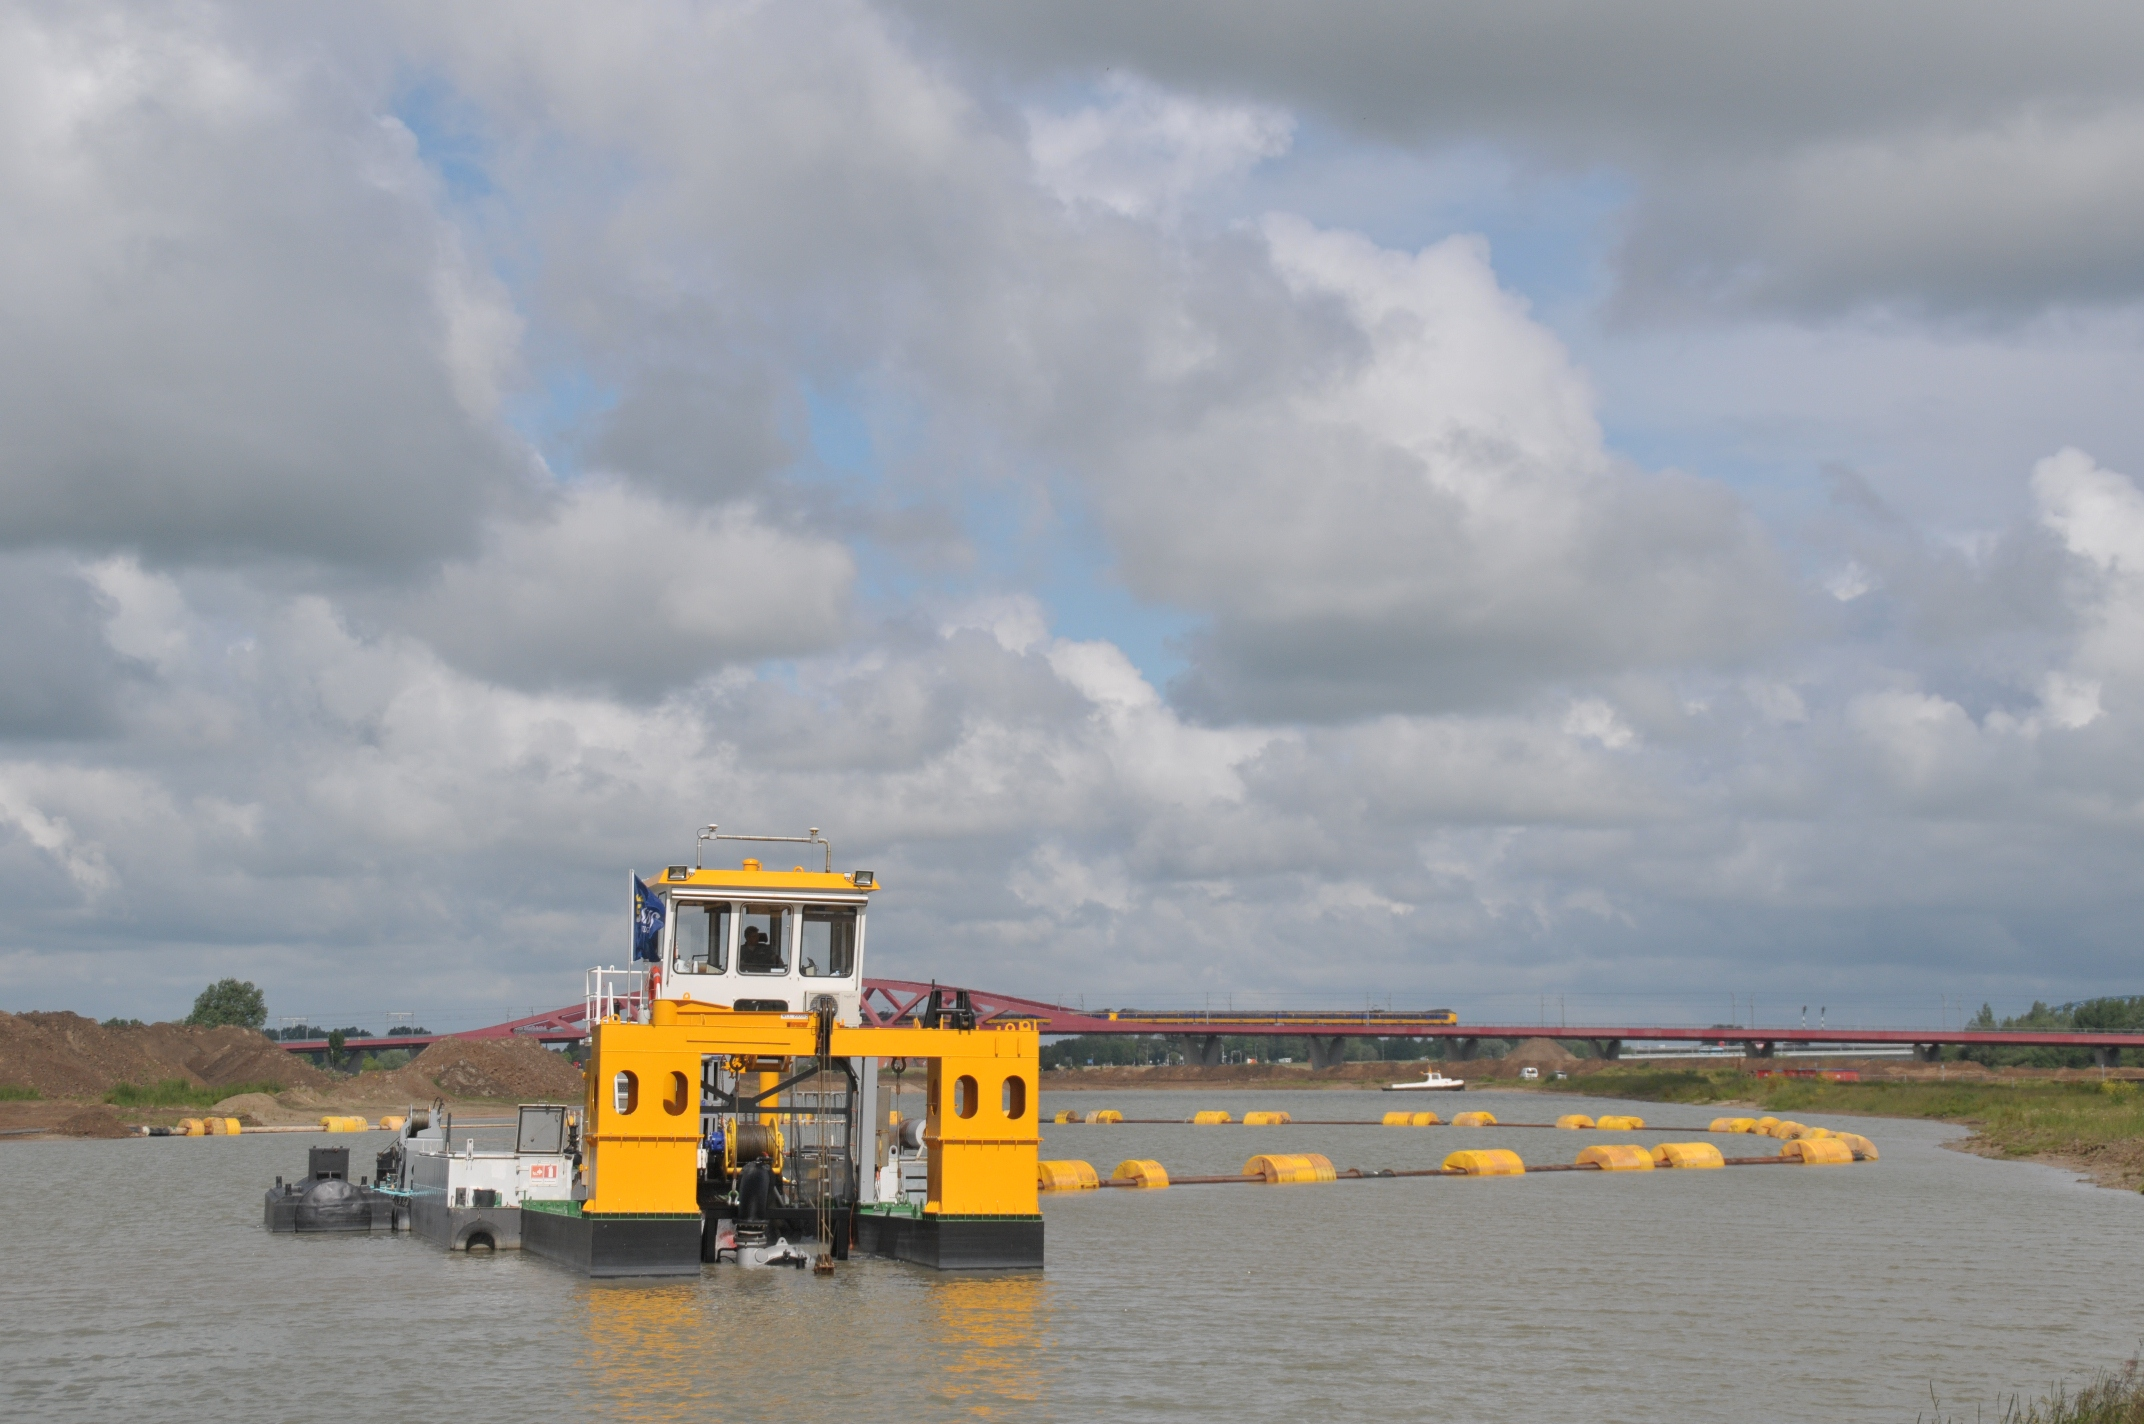 Photo of 'Stofzuigerschip' zuigt 400.000 kuub zand weg bij Zwolle Zuid